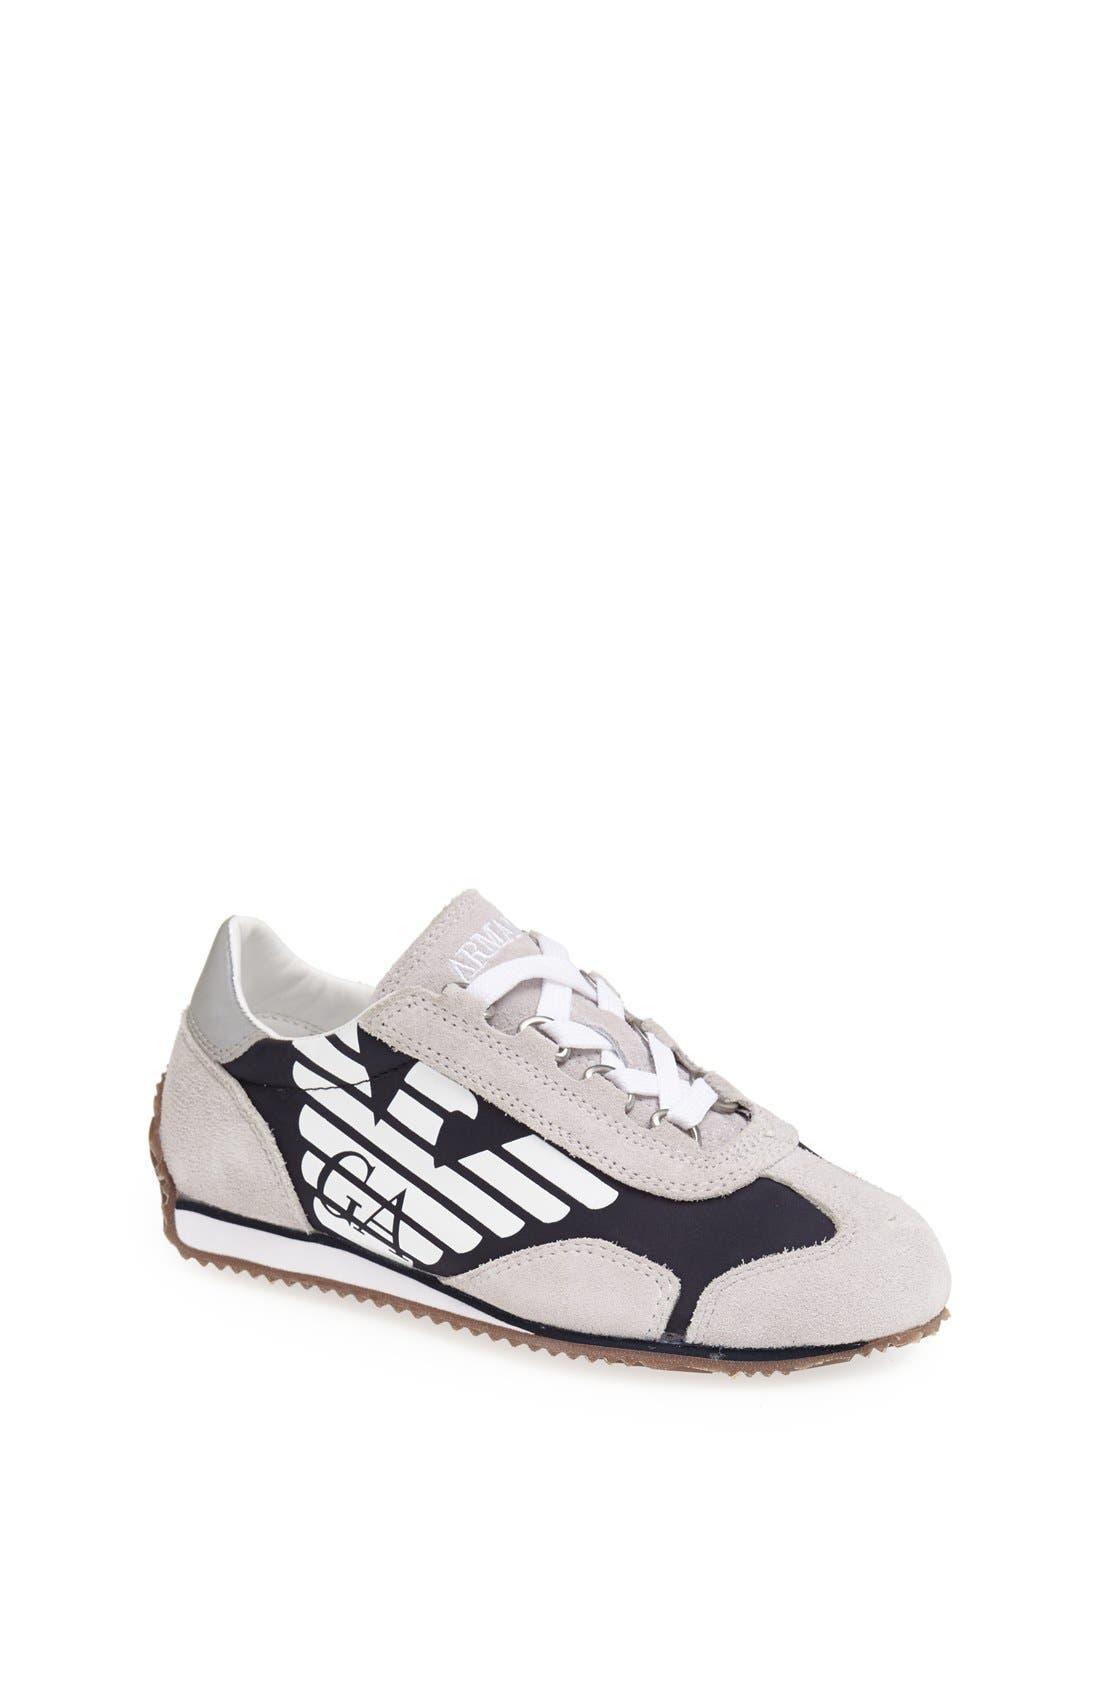 Alternate Image 1 Selected - Armani Junior Sneaker (Toddler, Little Kid & Big Kid)